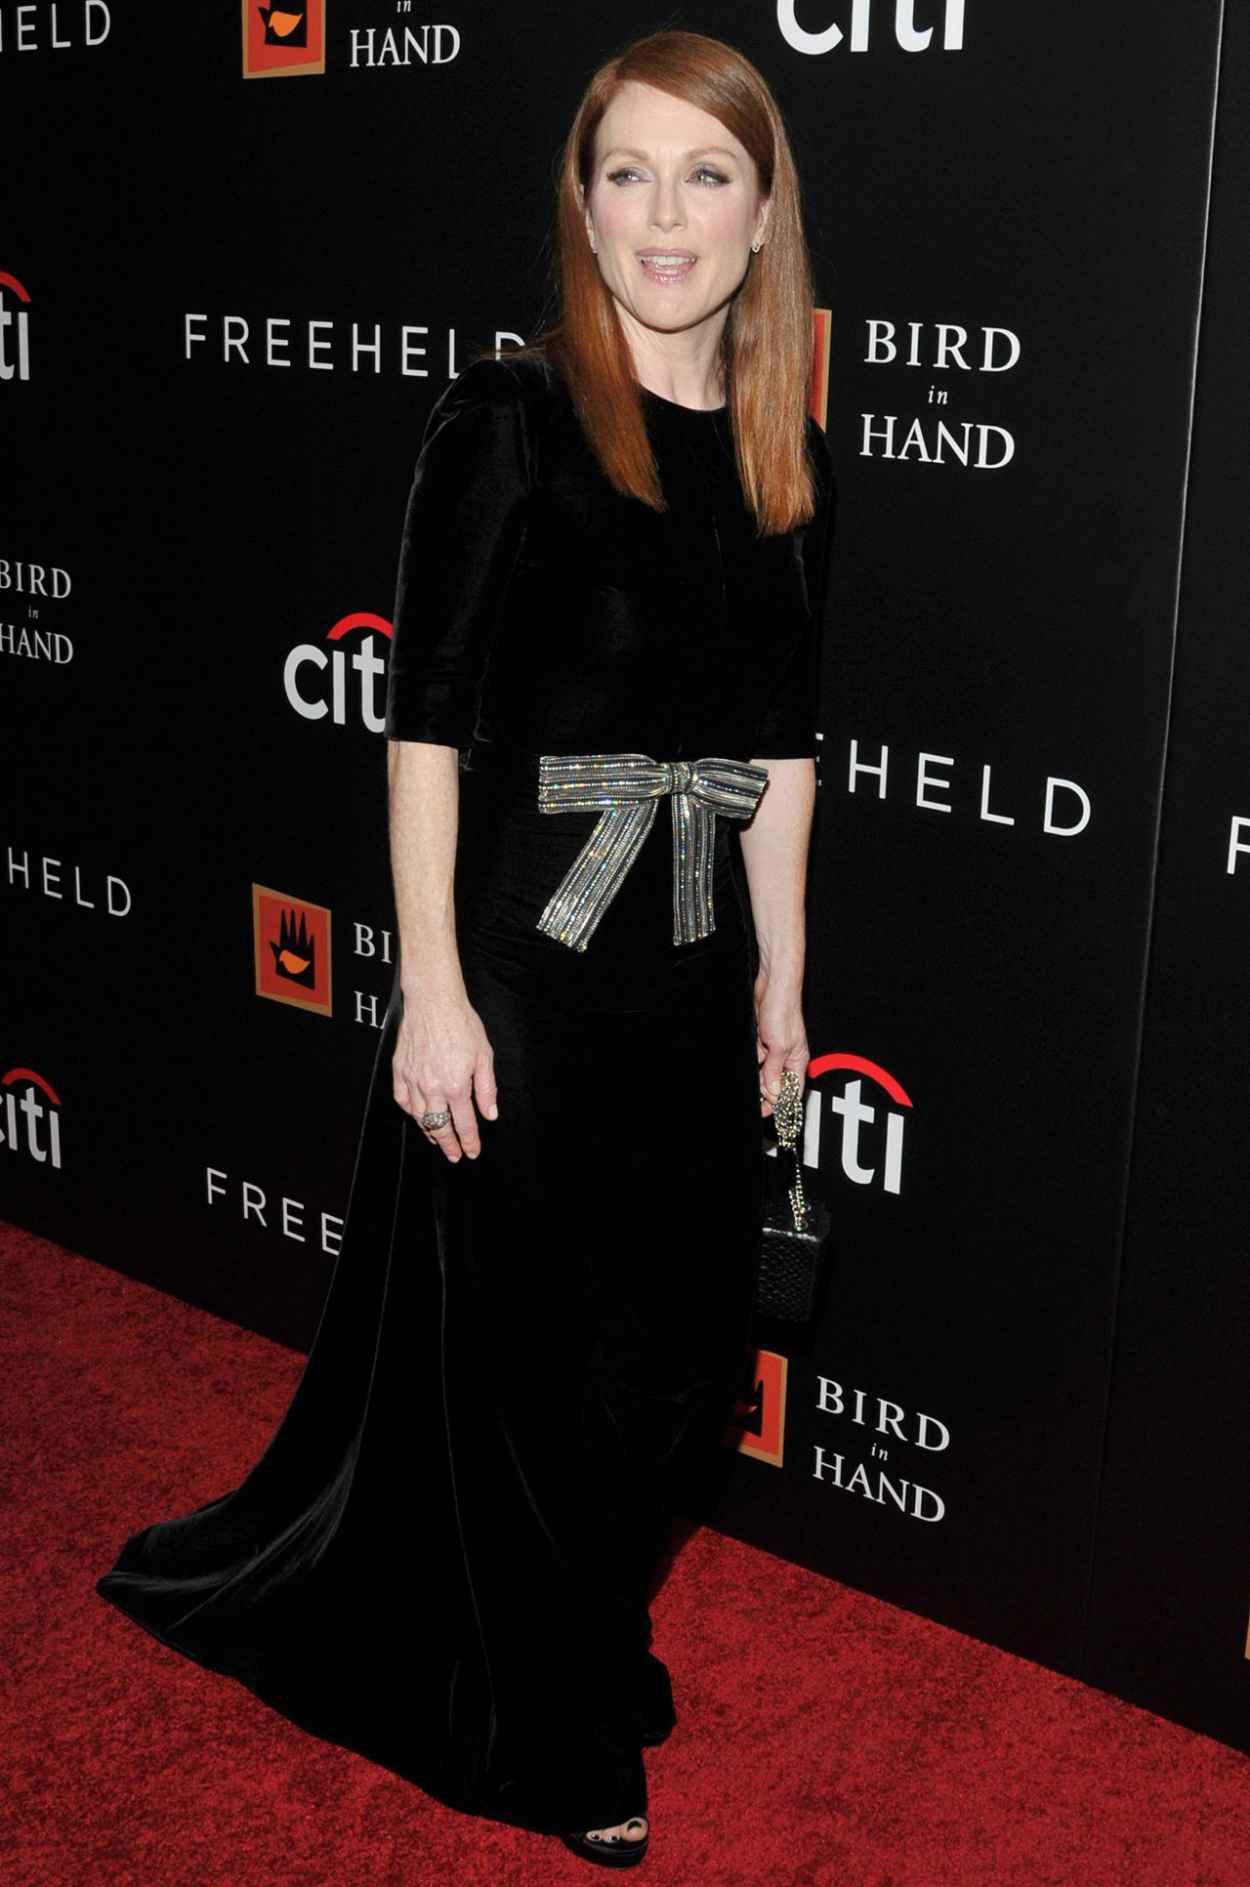 Julianne Moore - Freeheld Premiere in New York City-5